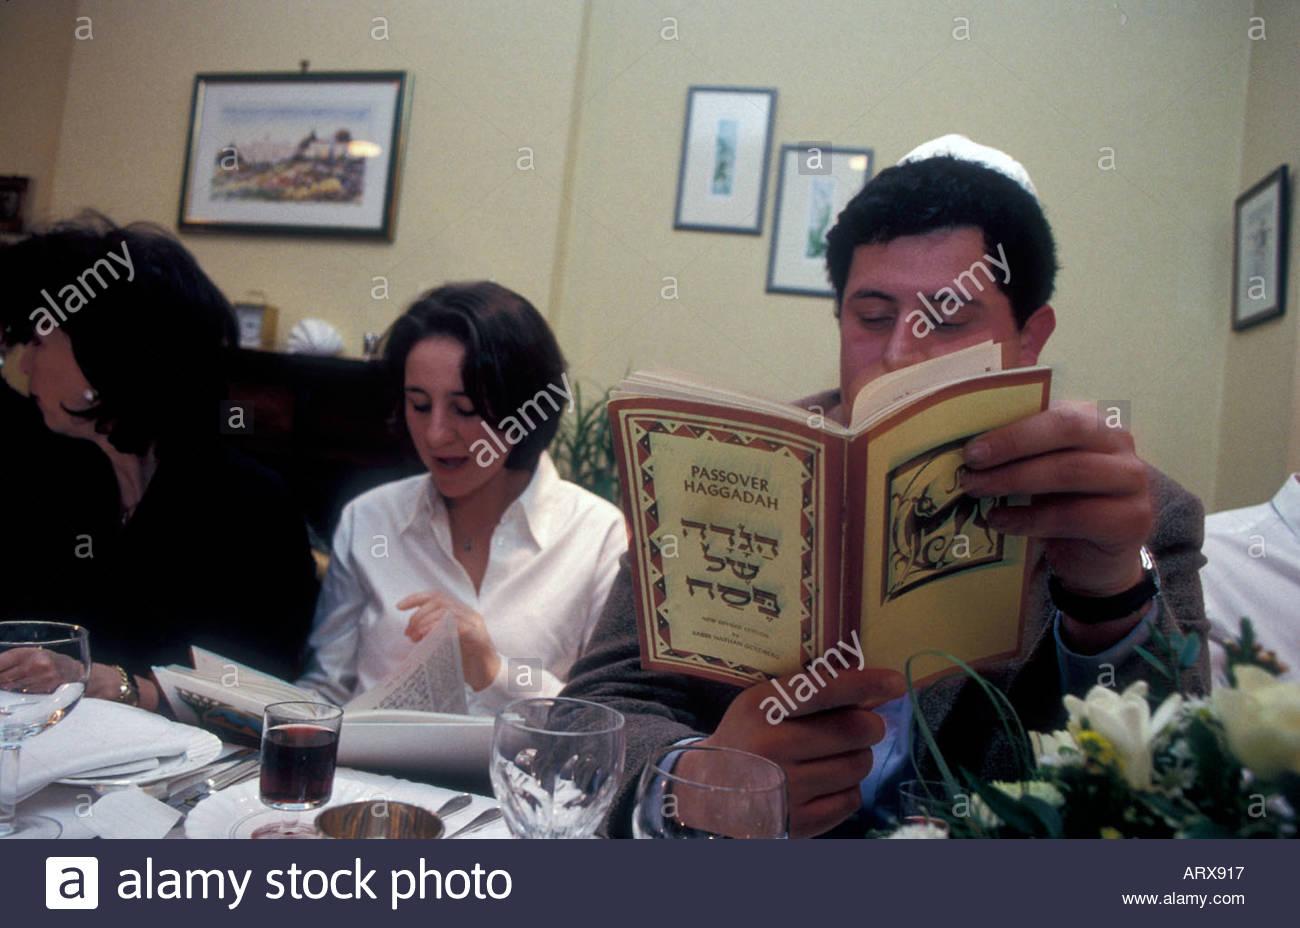 Reading from Hagaddah Passover prayer book at Seder night meal UK - Stock Image